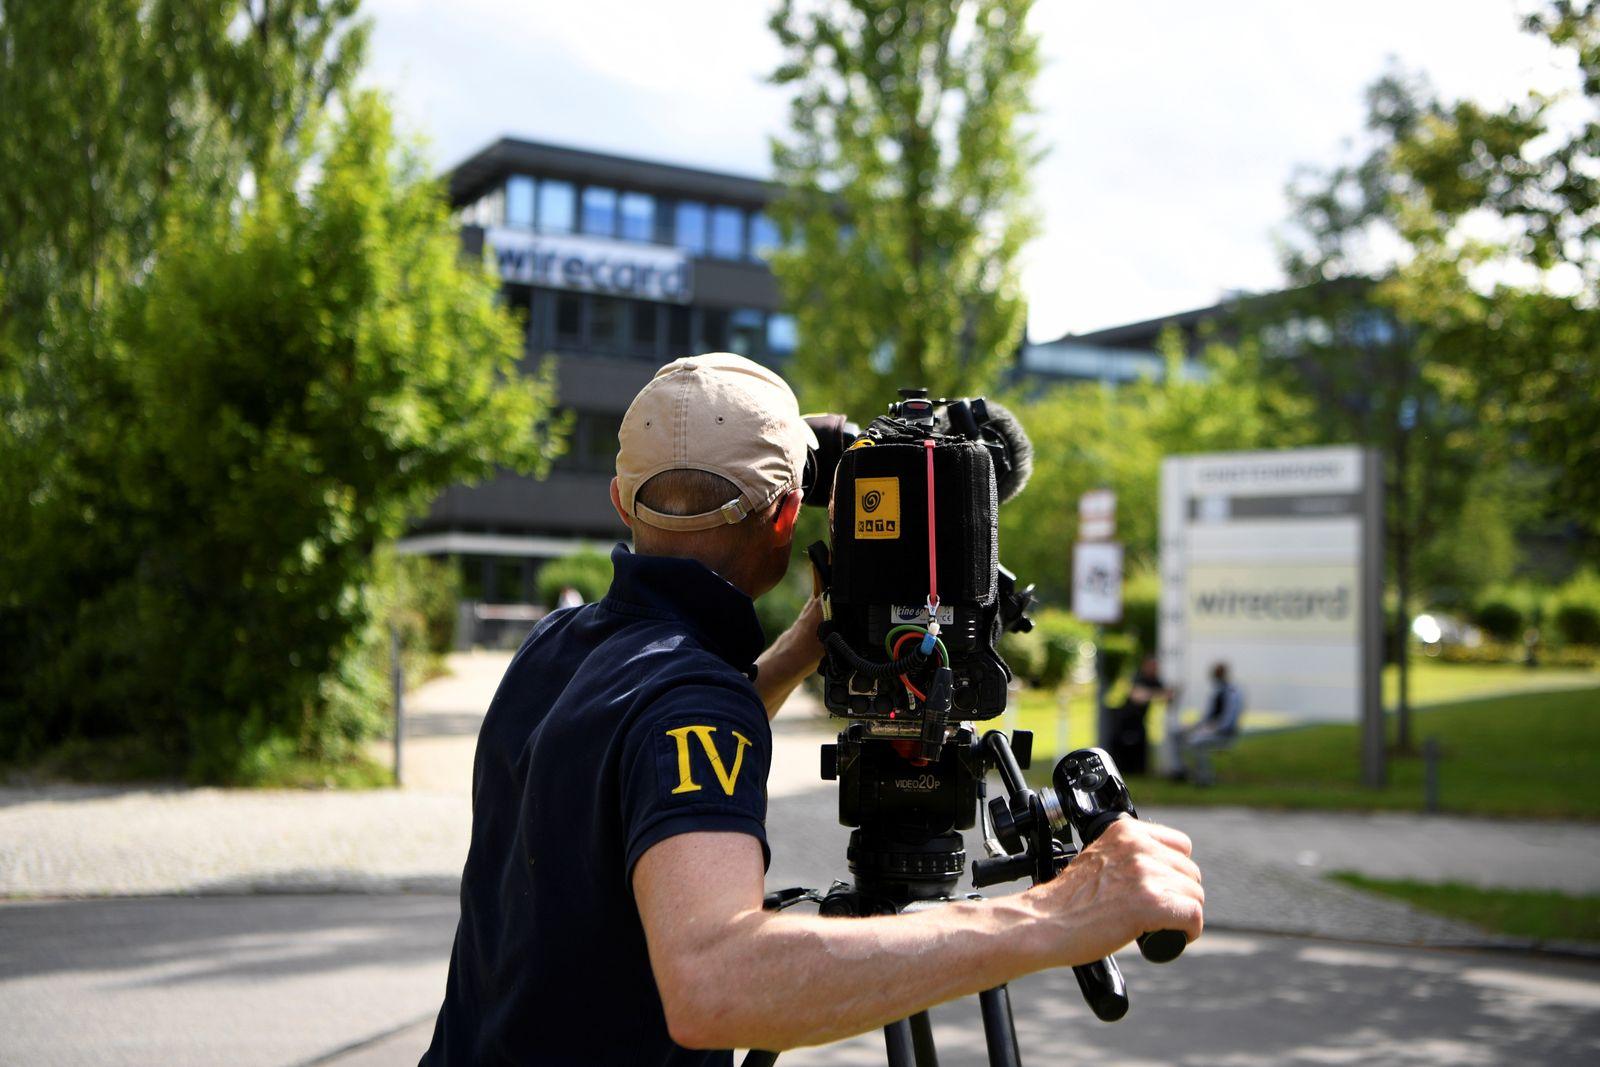 A cameraman films the headquarters of Wirecard AG in Aschheim